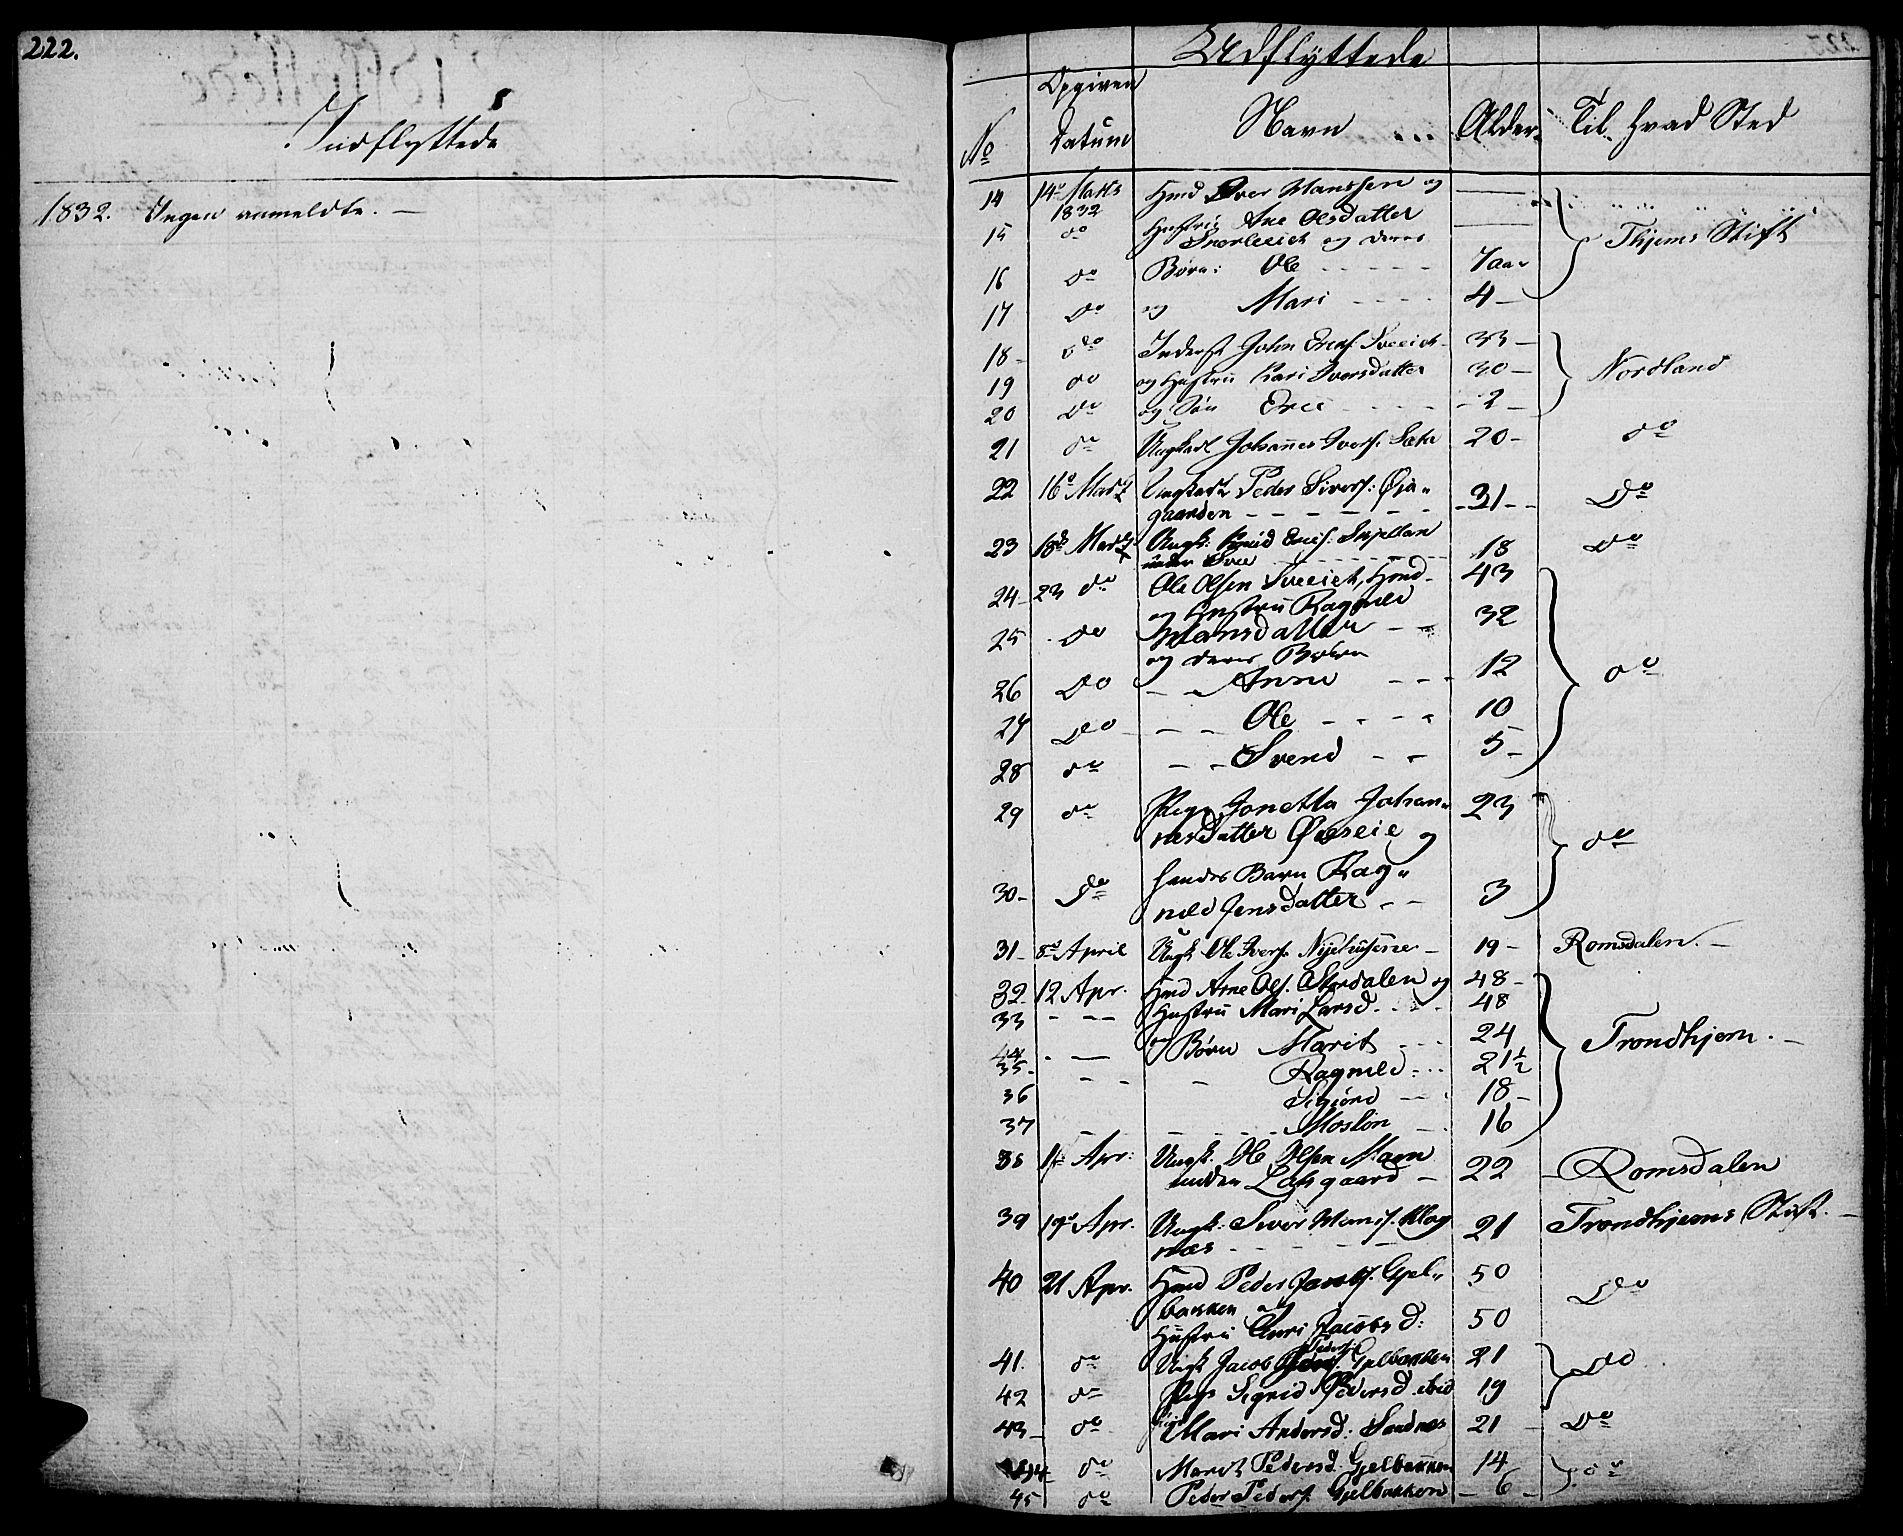 SAH, Vågå prestekontor, Ministerialbok nr. 4 /1, 1827-1842, s. 222